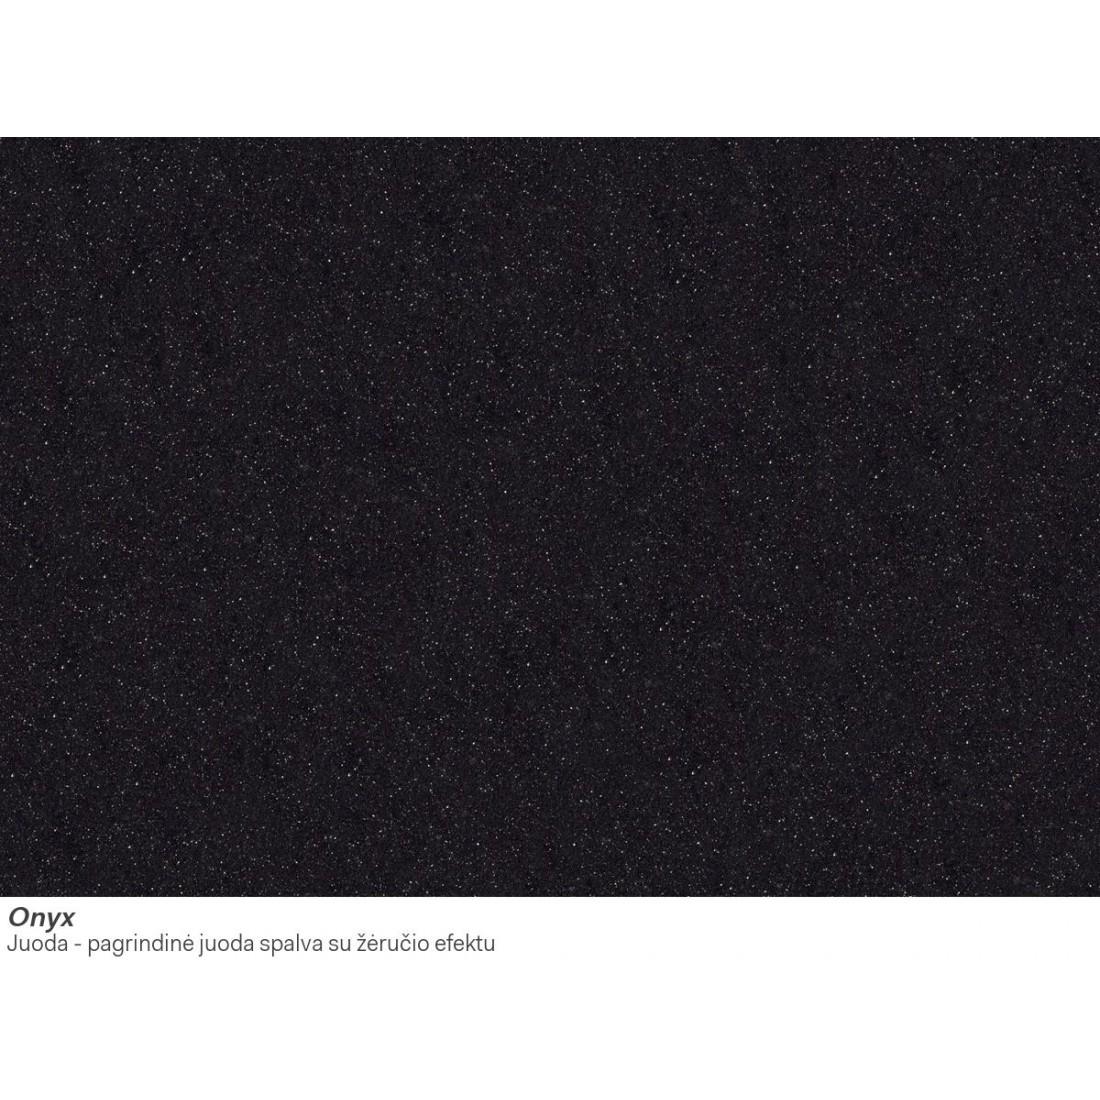 Akmens masės plautuvė Franke Ronda ROG 611-62, ekscentrinis ventilis, Onyx